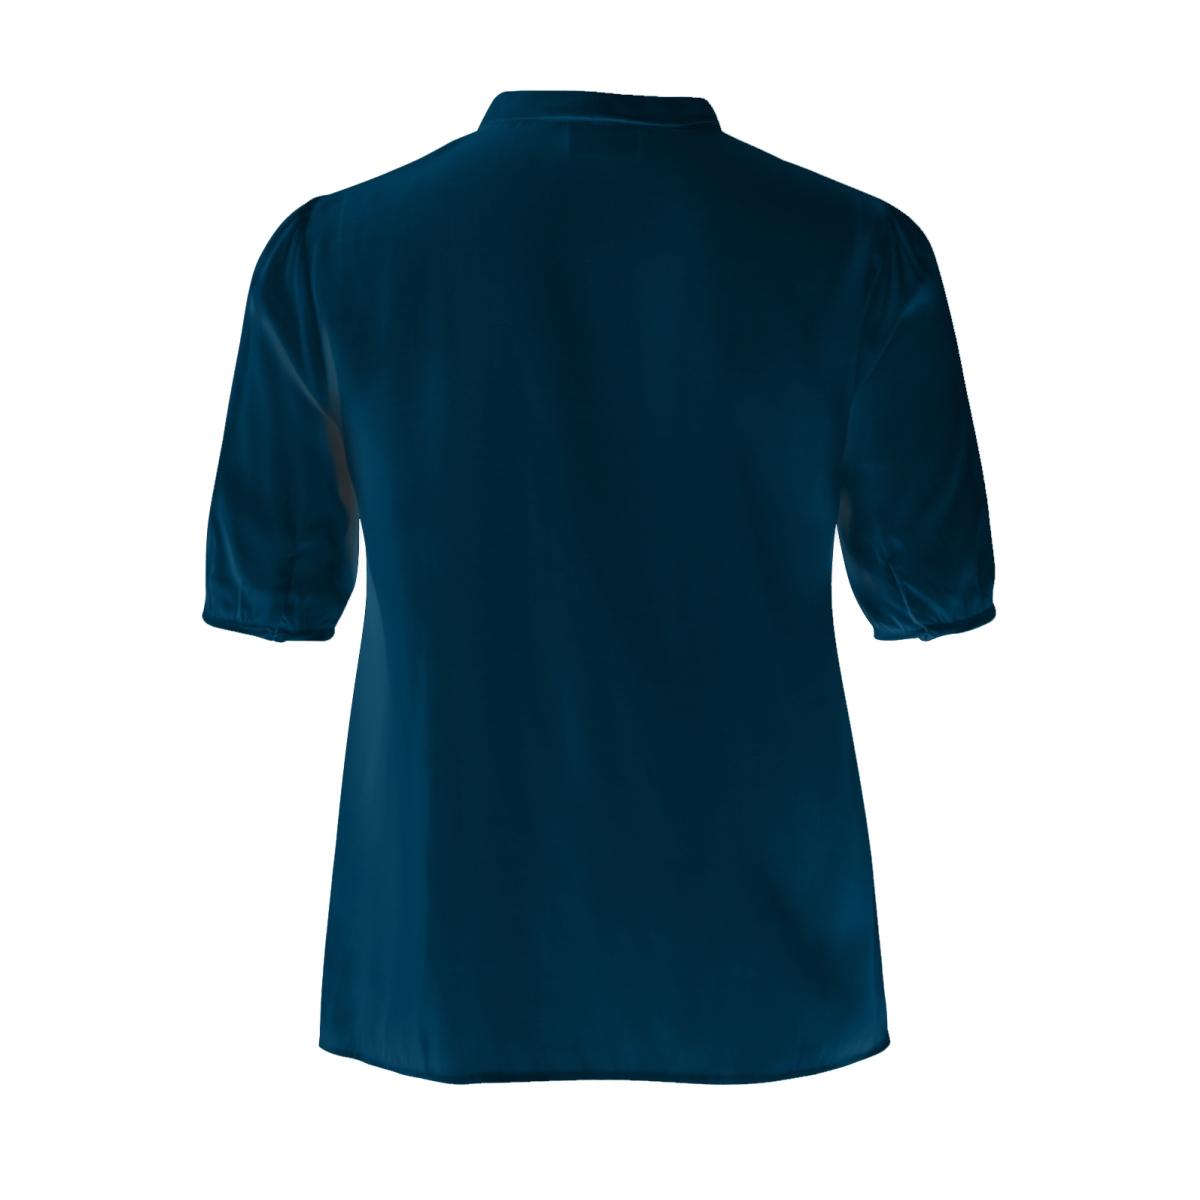 viflama 1/2 sleeve top gv 14042855 vila blouse dark navy